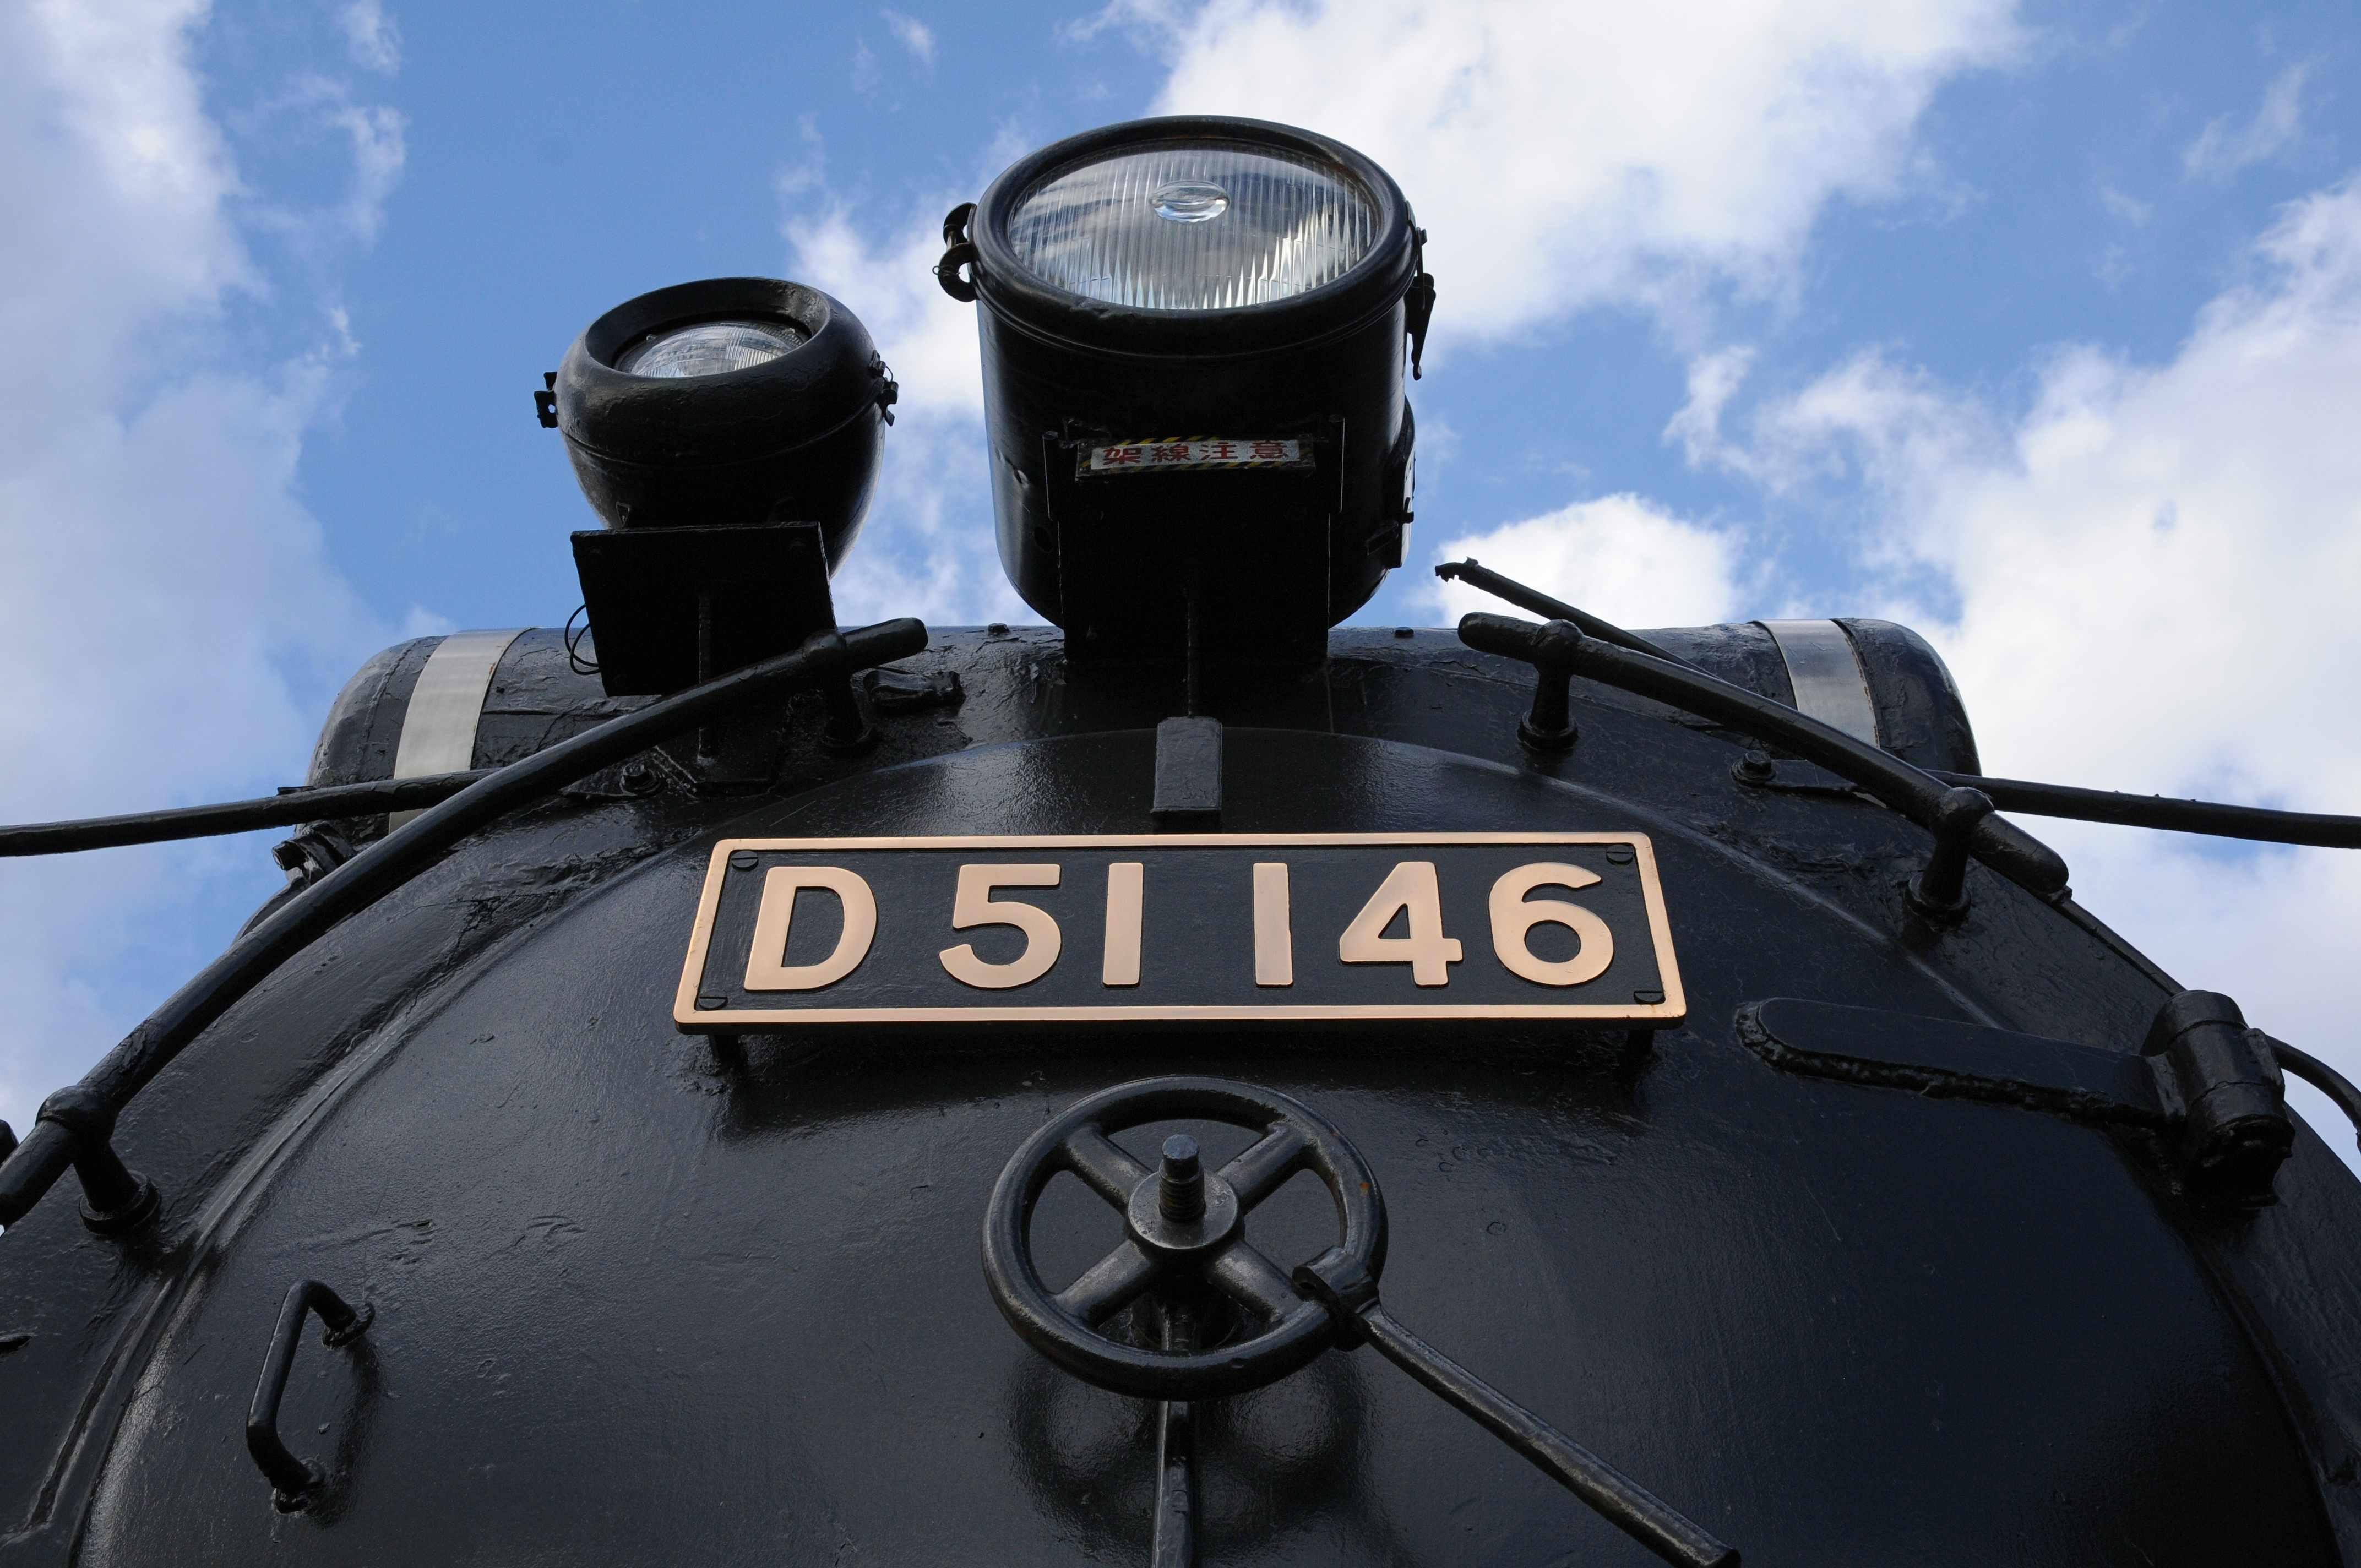 DSC_6524-1.jpg